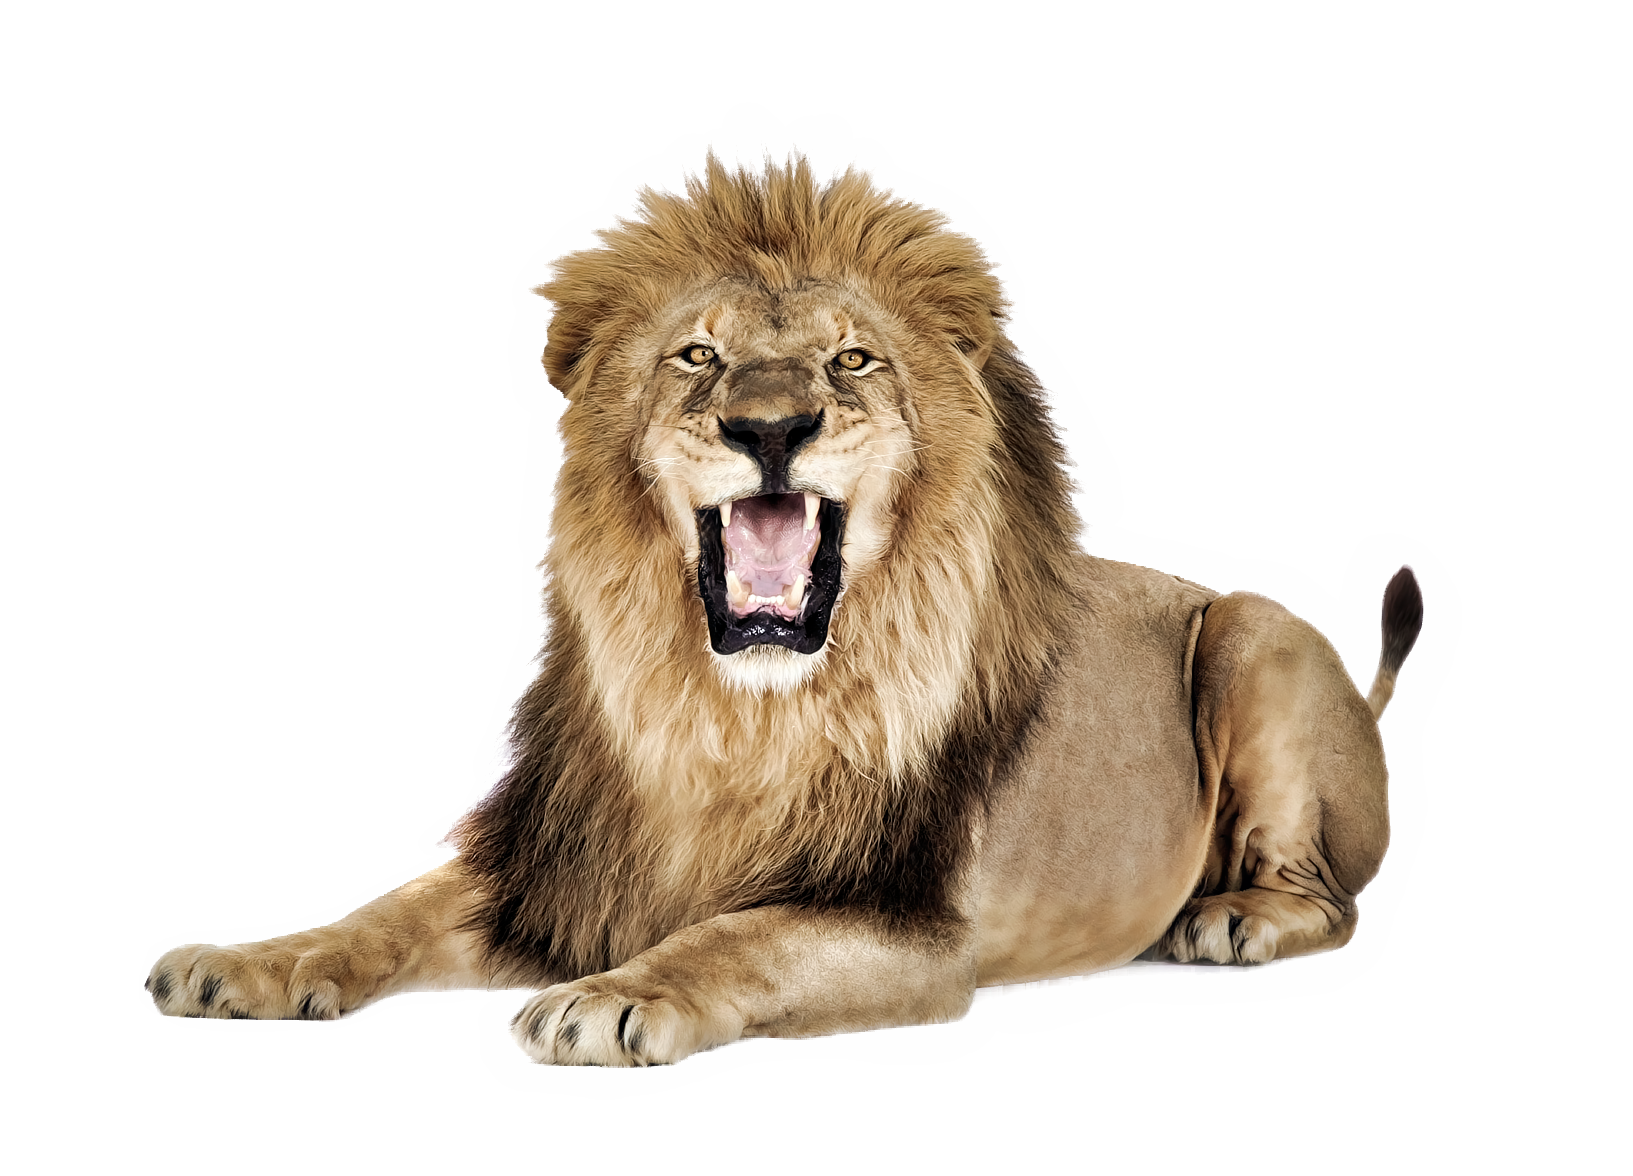 Big Explosion Png Png Image Purepng: Lion Roaring PNG Image - PurePNG